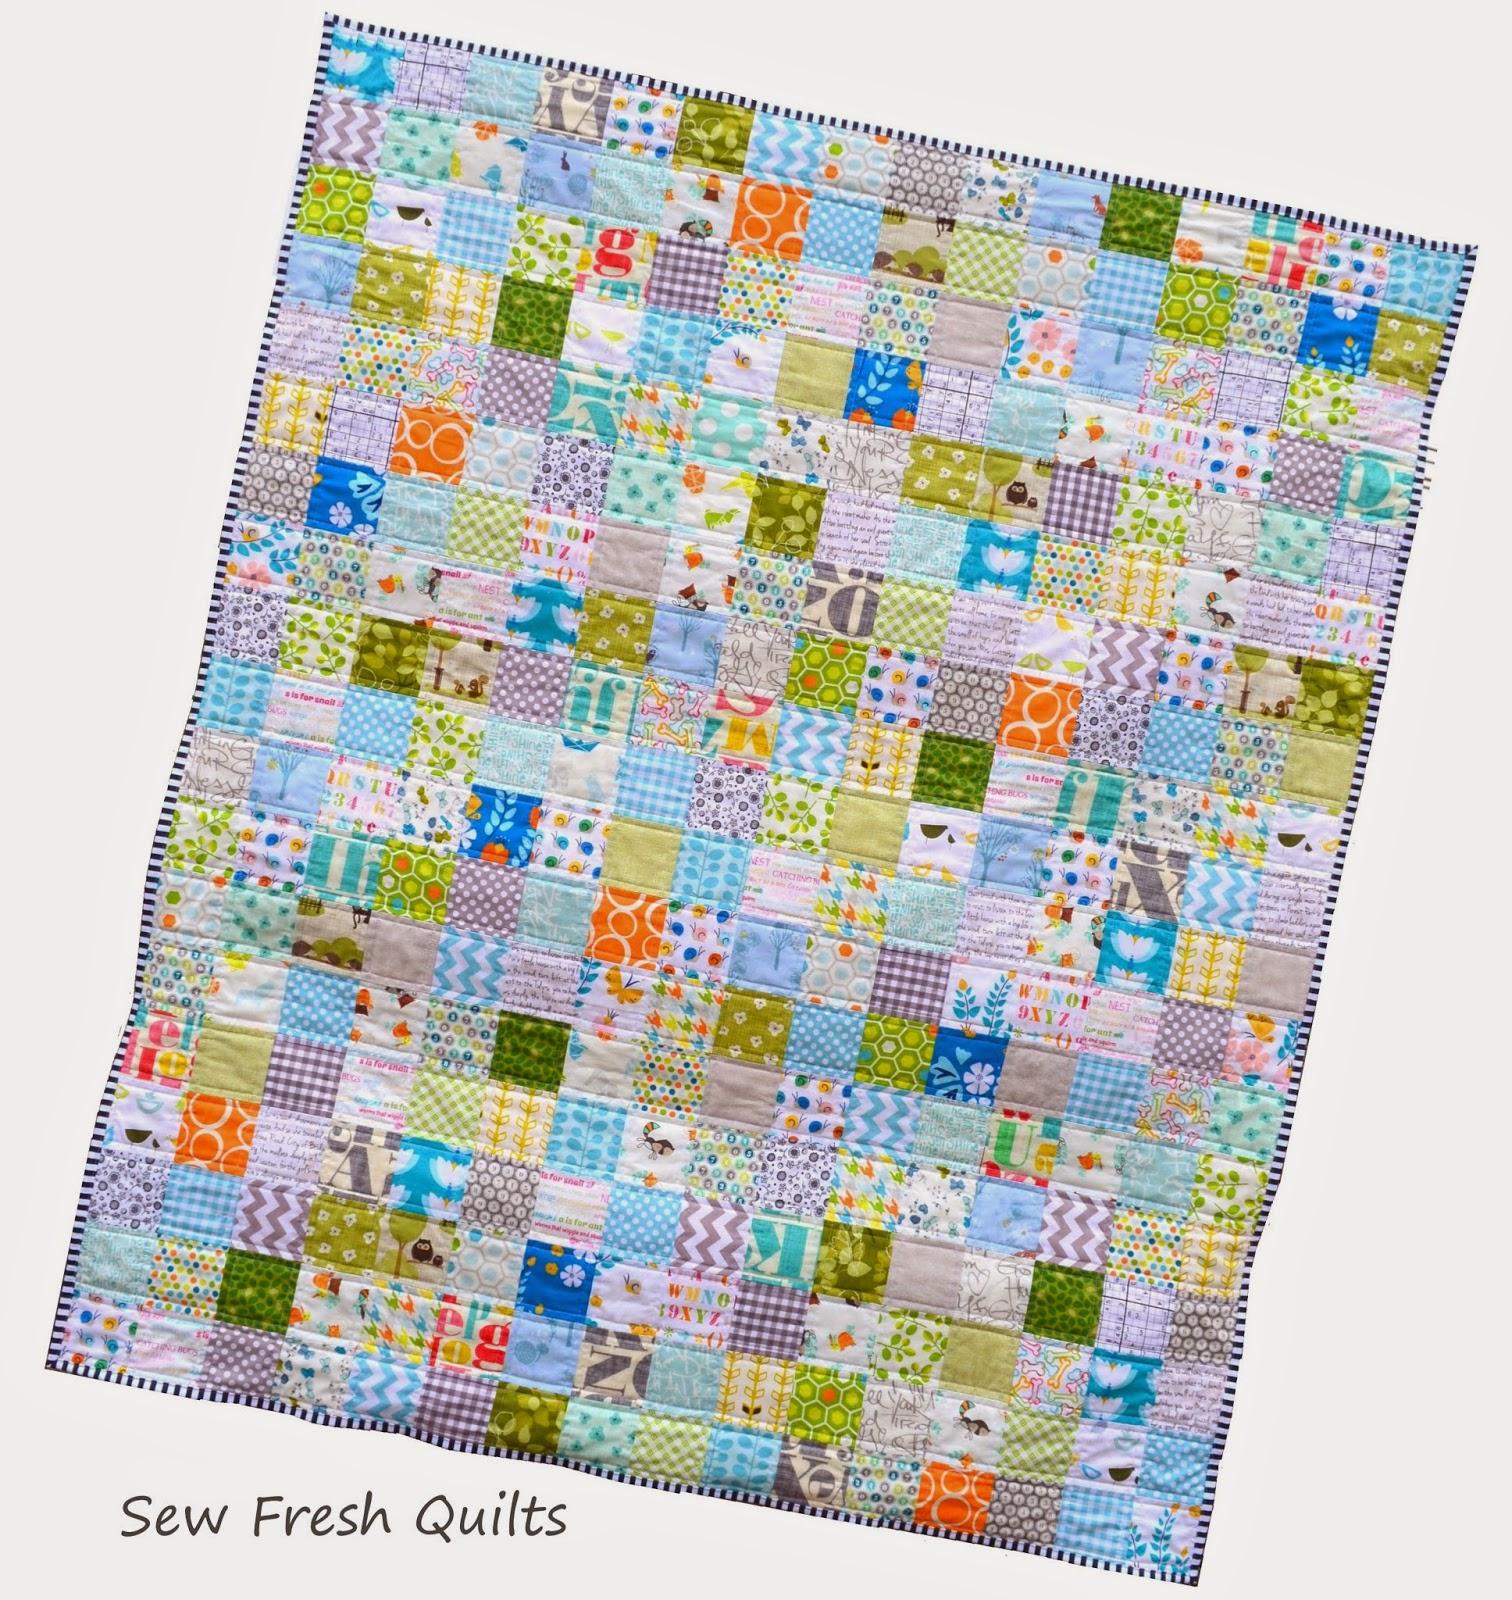 http://sewfreshquilts.blogspot.ca/2014/12/a-custom-order-baby-boy-quilt.html